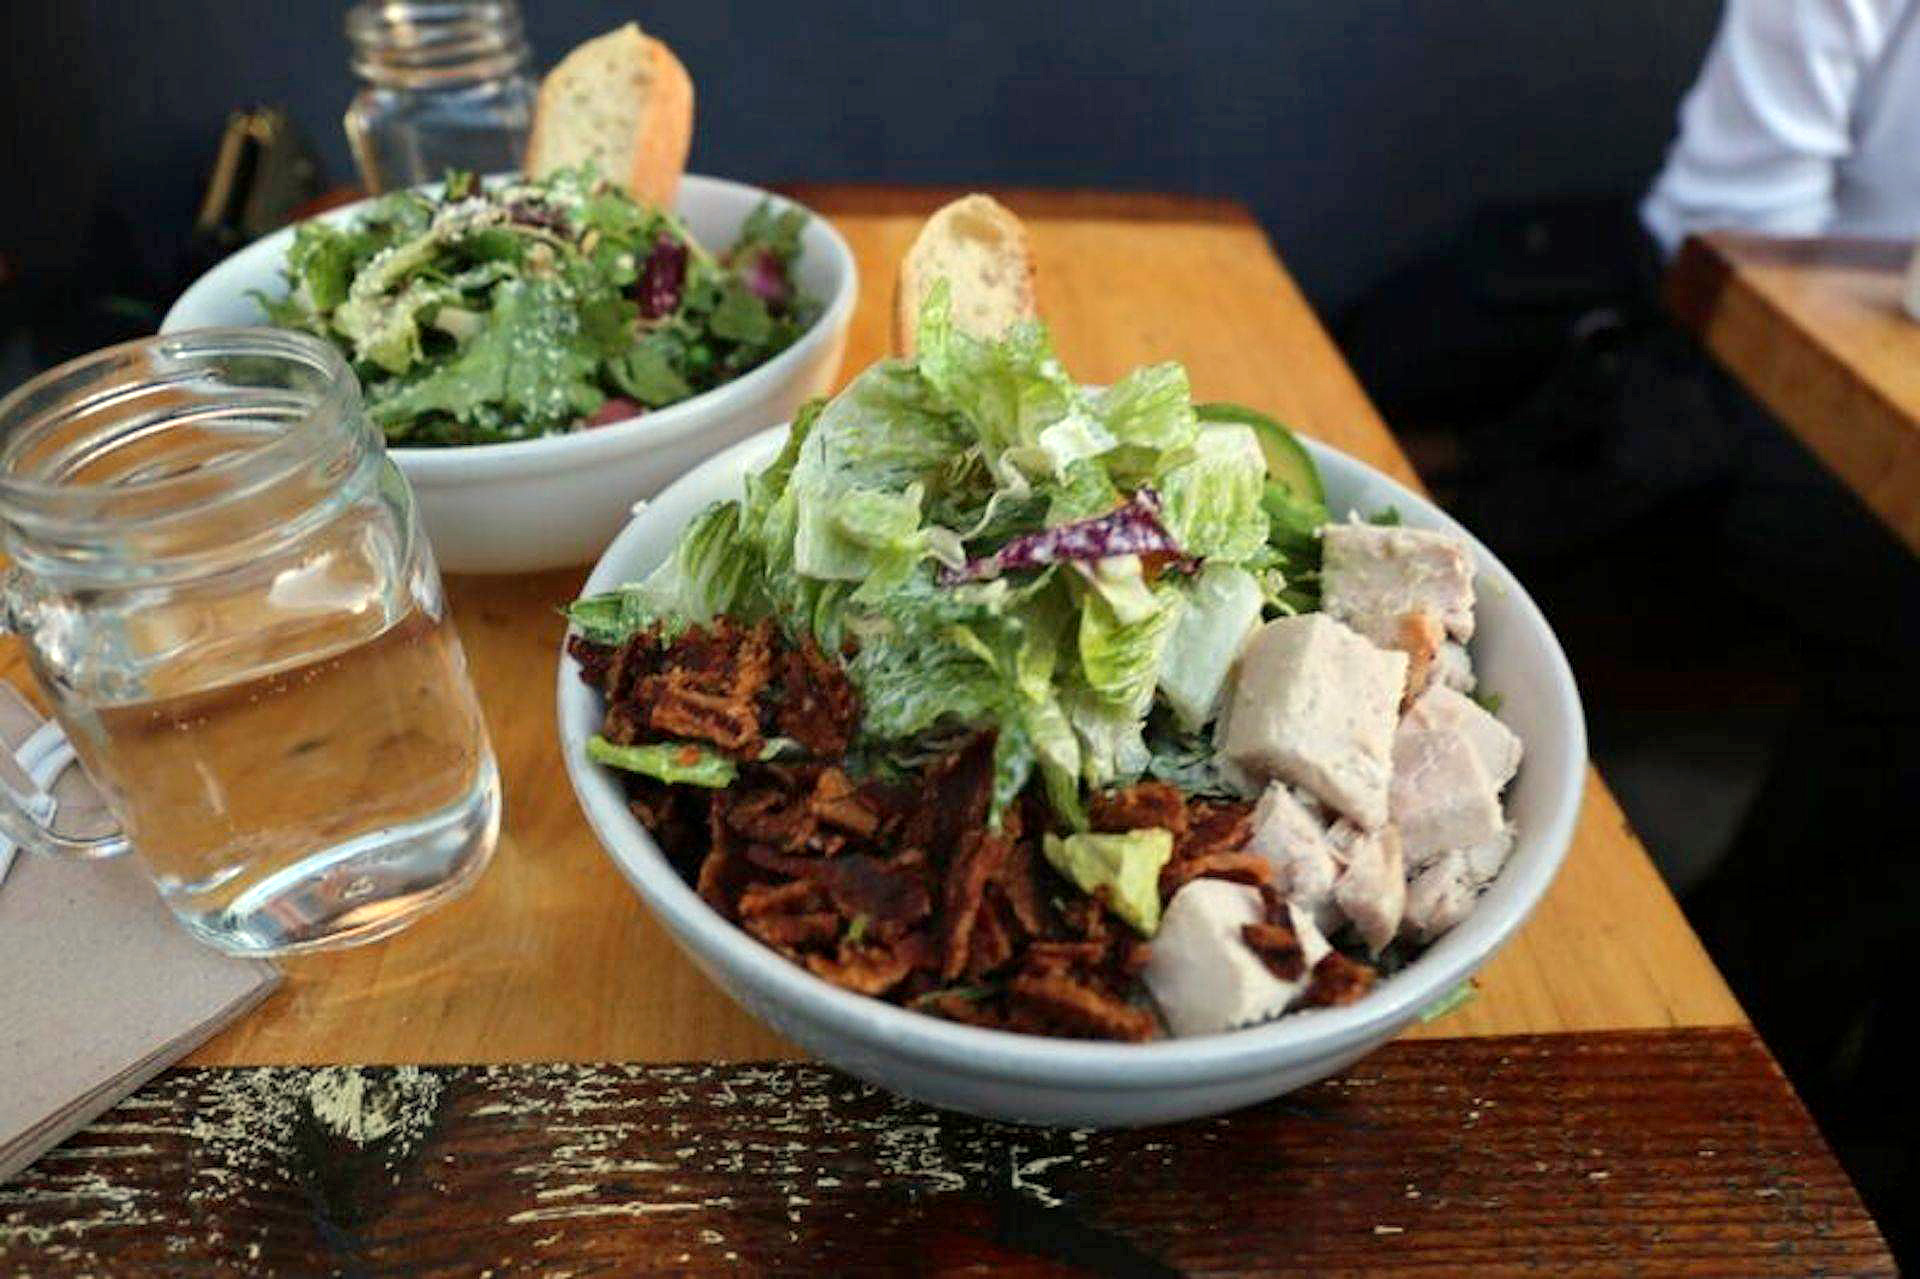 The Cobber salad